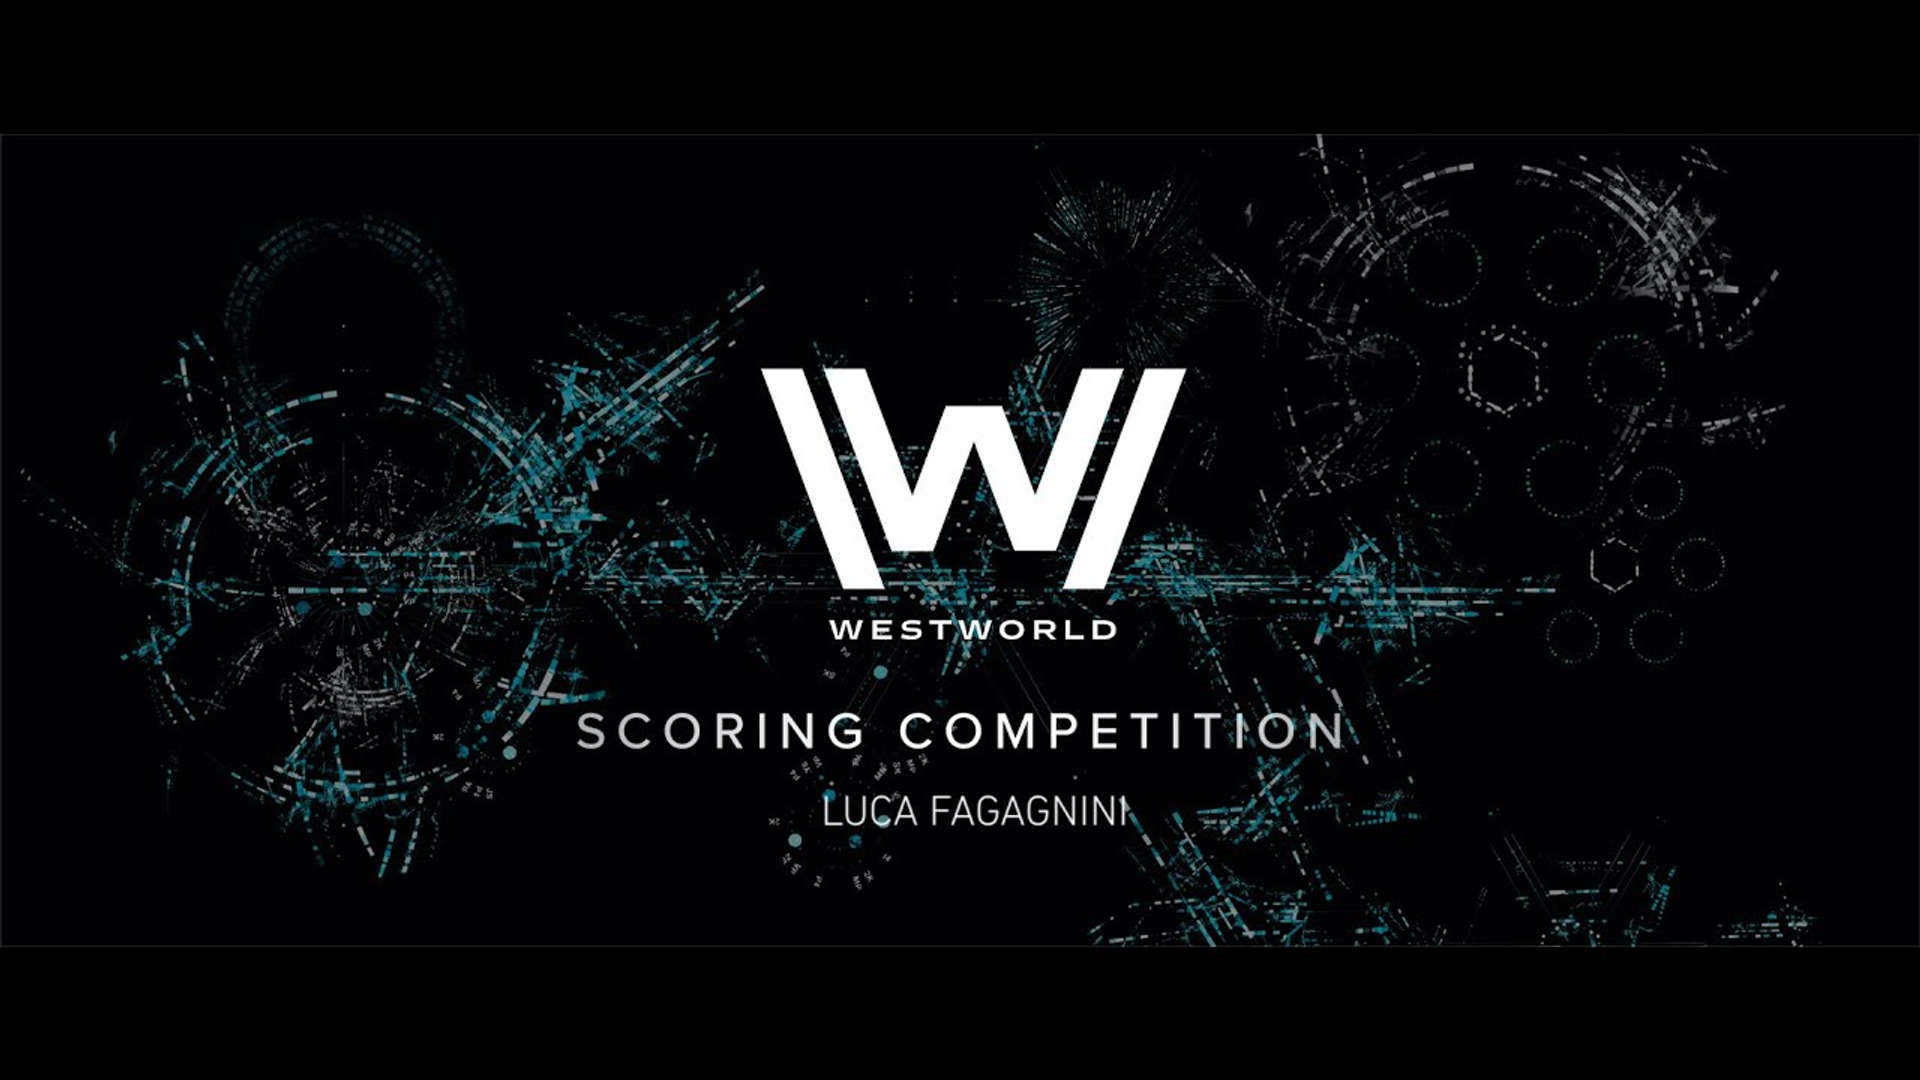 Westworld Scoring Competition